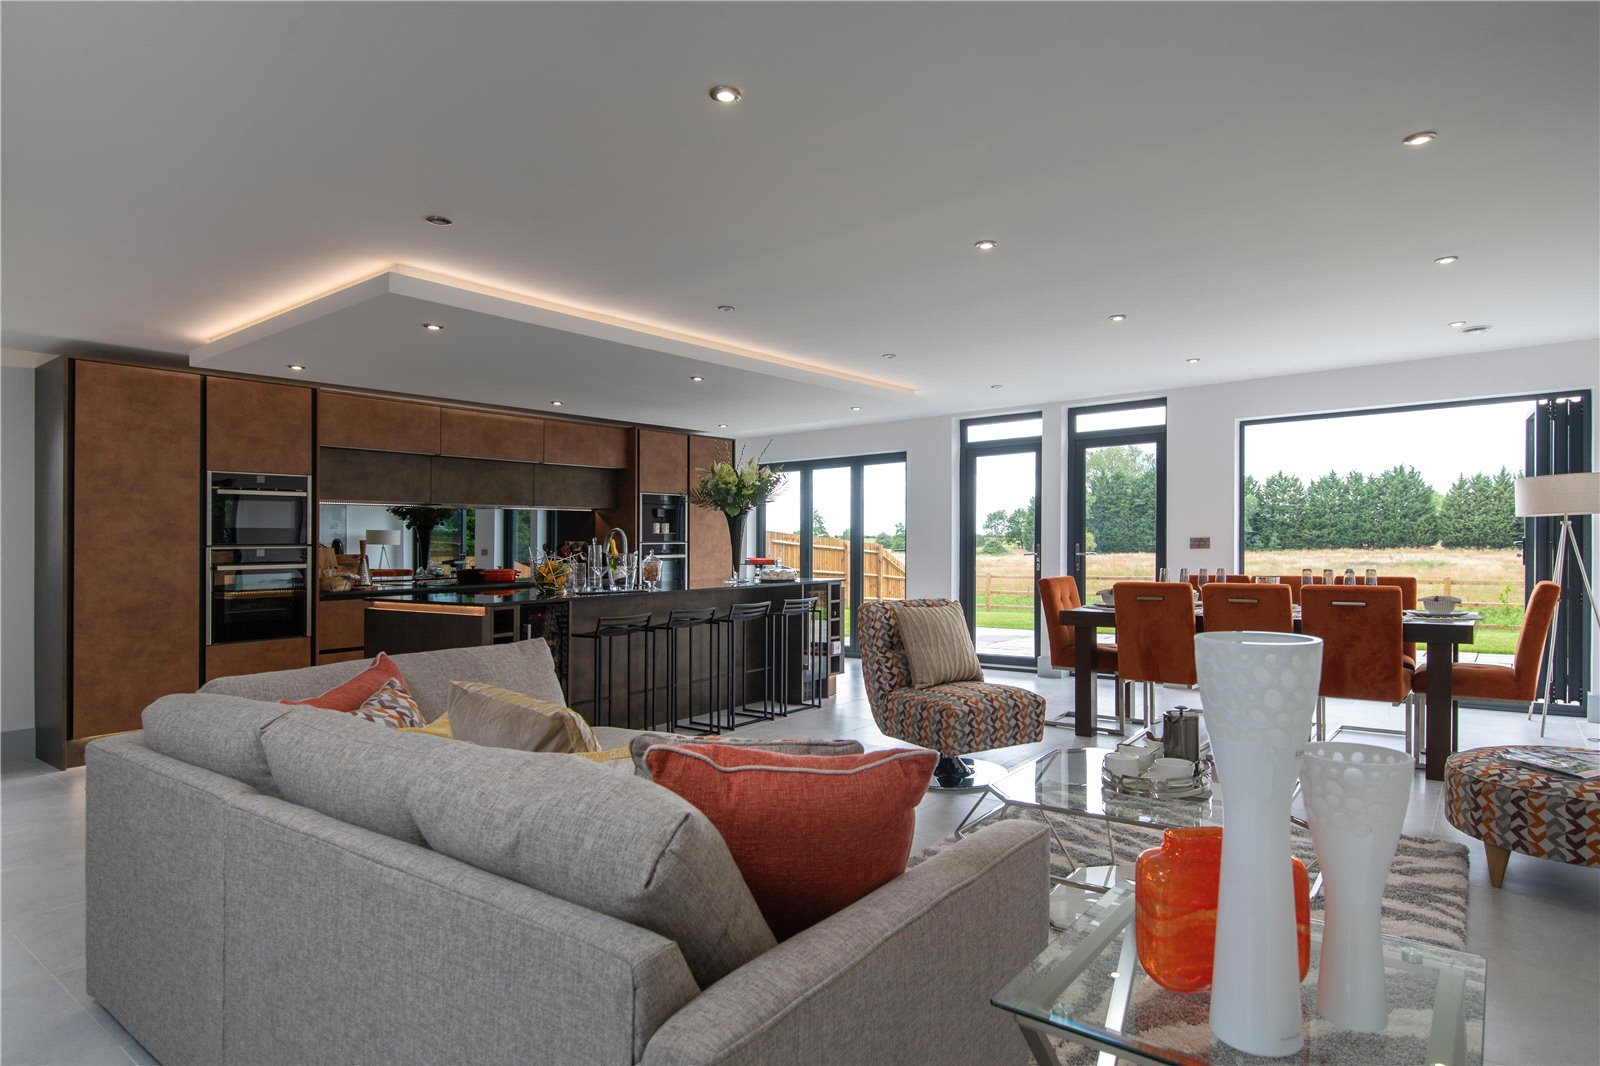 4 bed house for sale in The Range, Eynesbury Hardwicke - Property Image 1